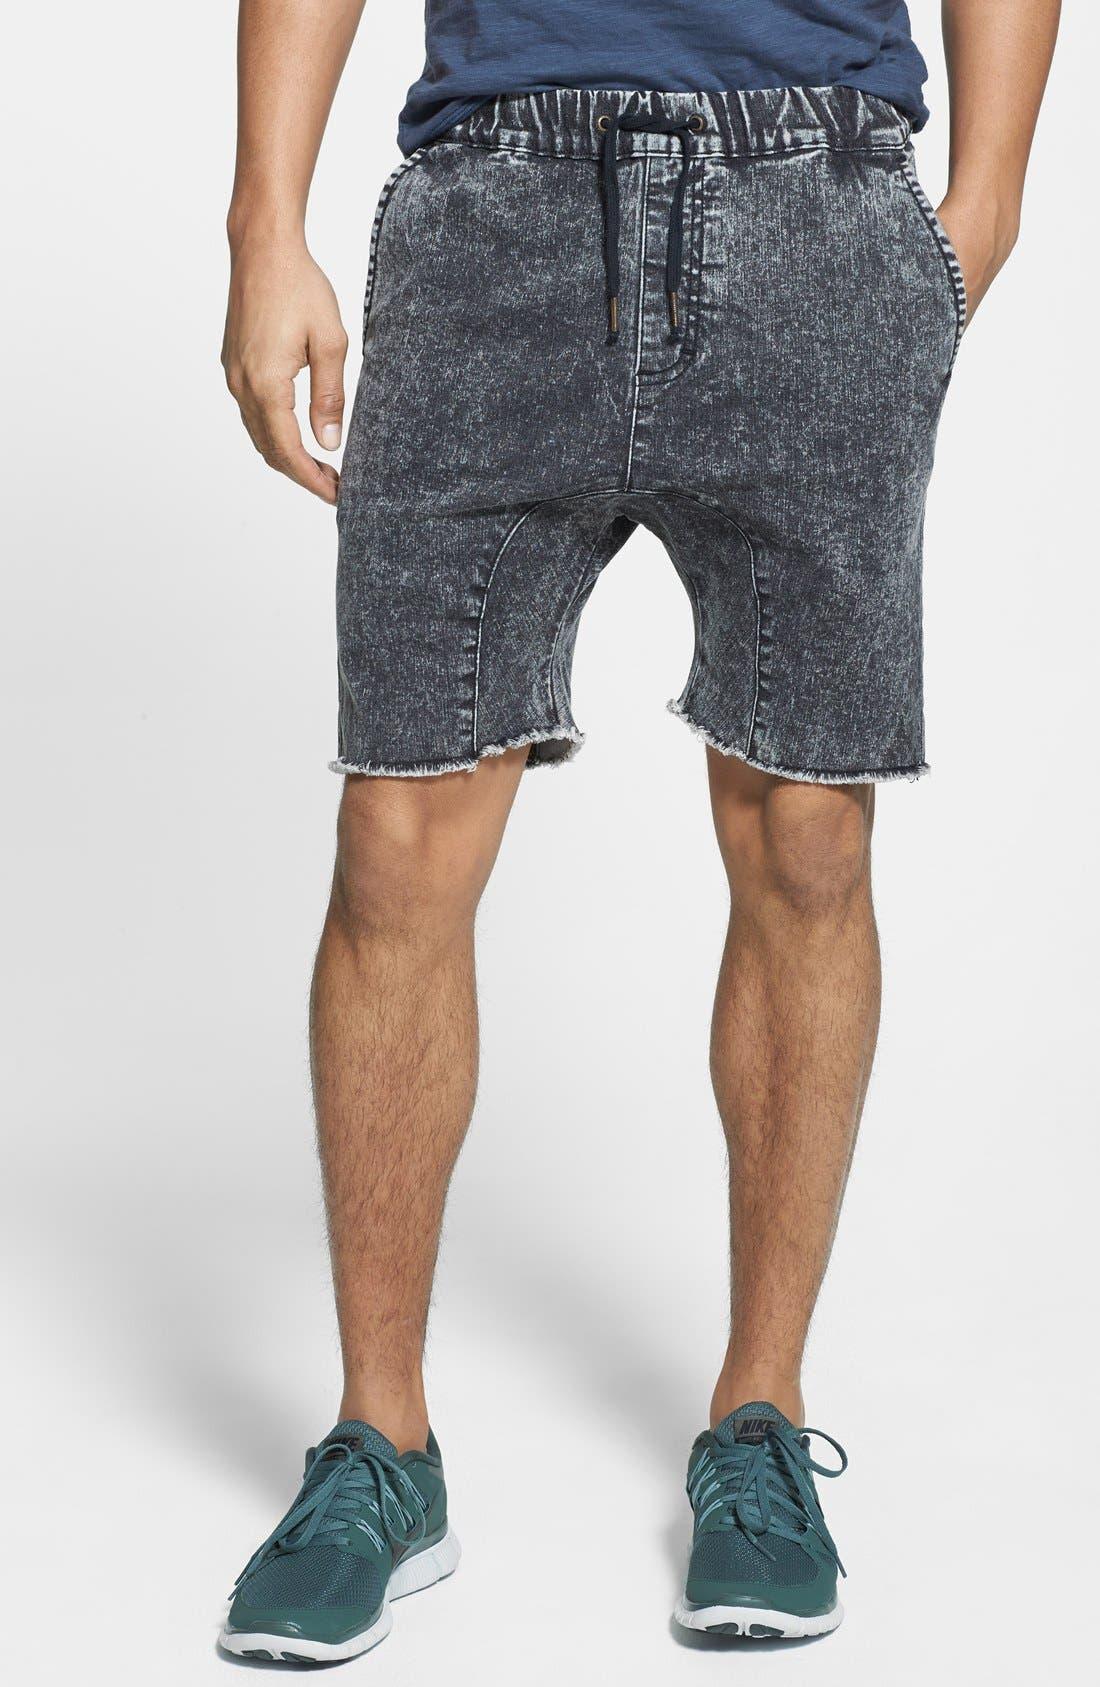 Alternate Image 1 Selected - ZANEROBE 'Sureshot' Cutoff Jogger Shorts